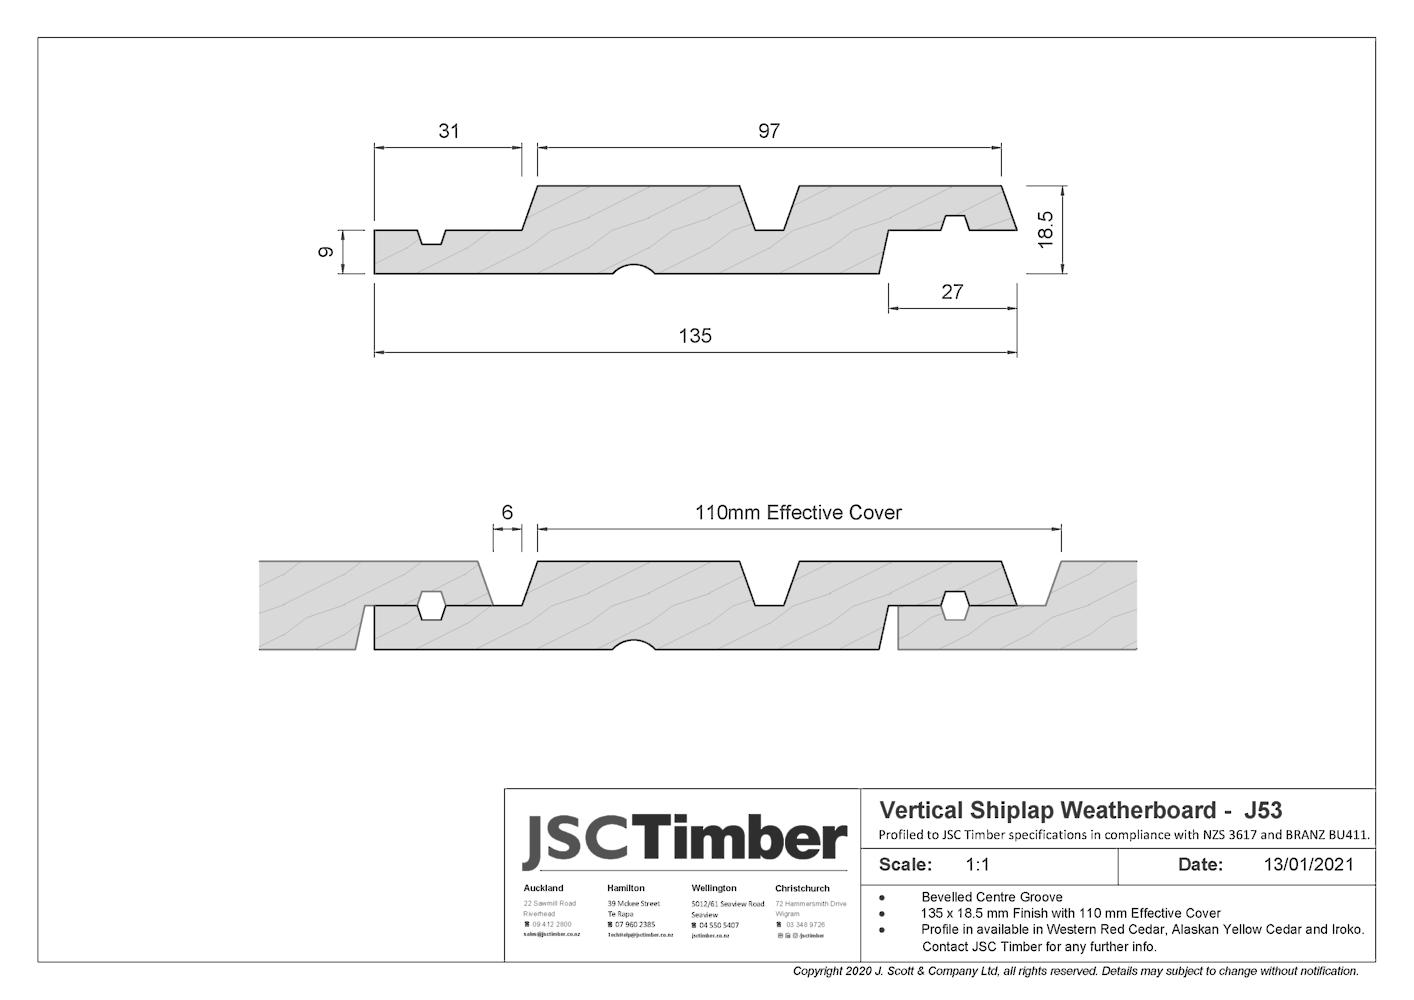 J53 Vertical Shiplap Weatherboard